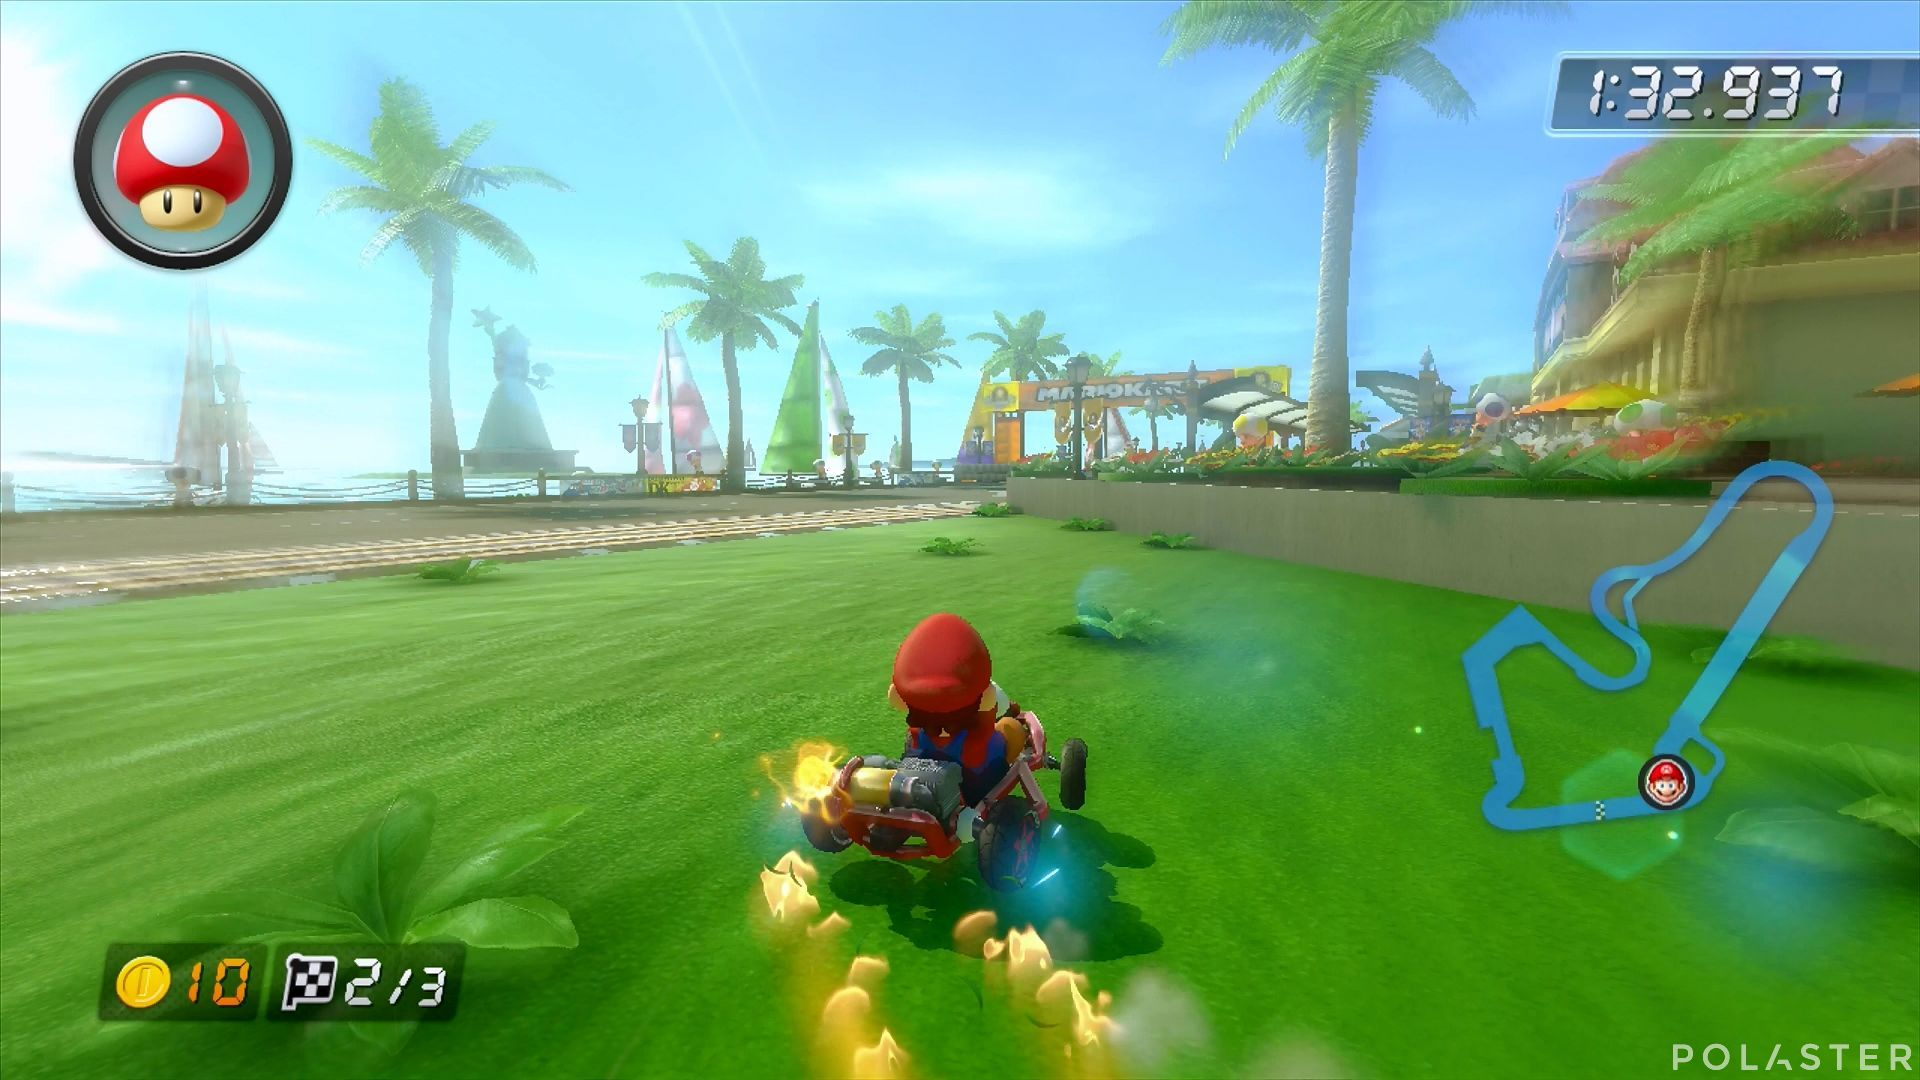 Mario Kart 8 - Puerto Toad